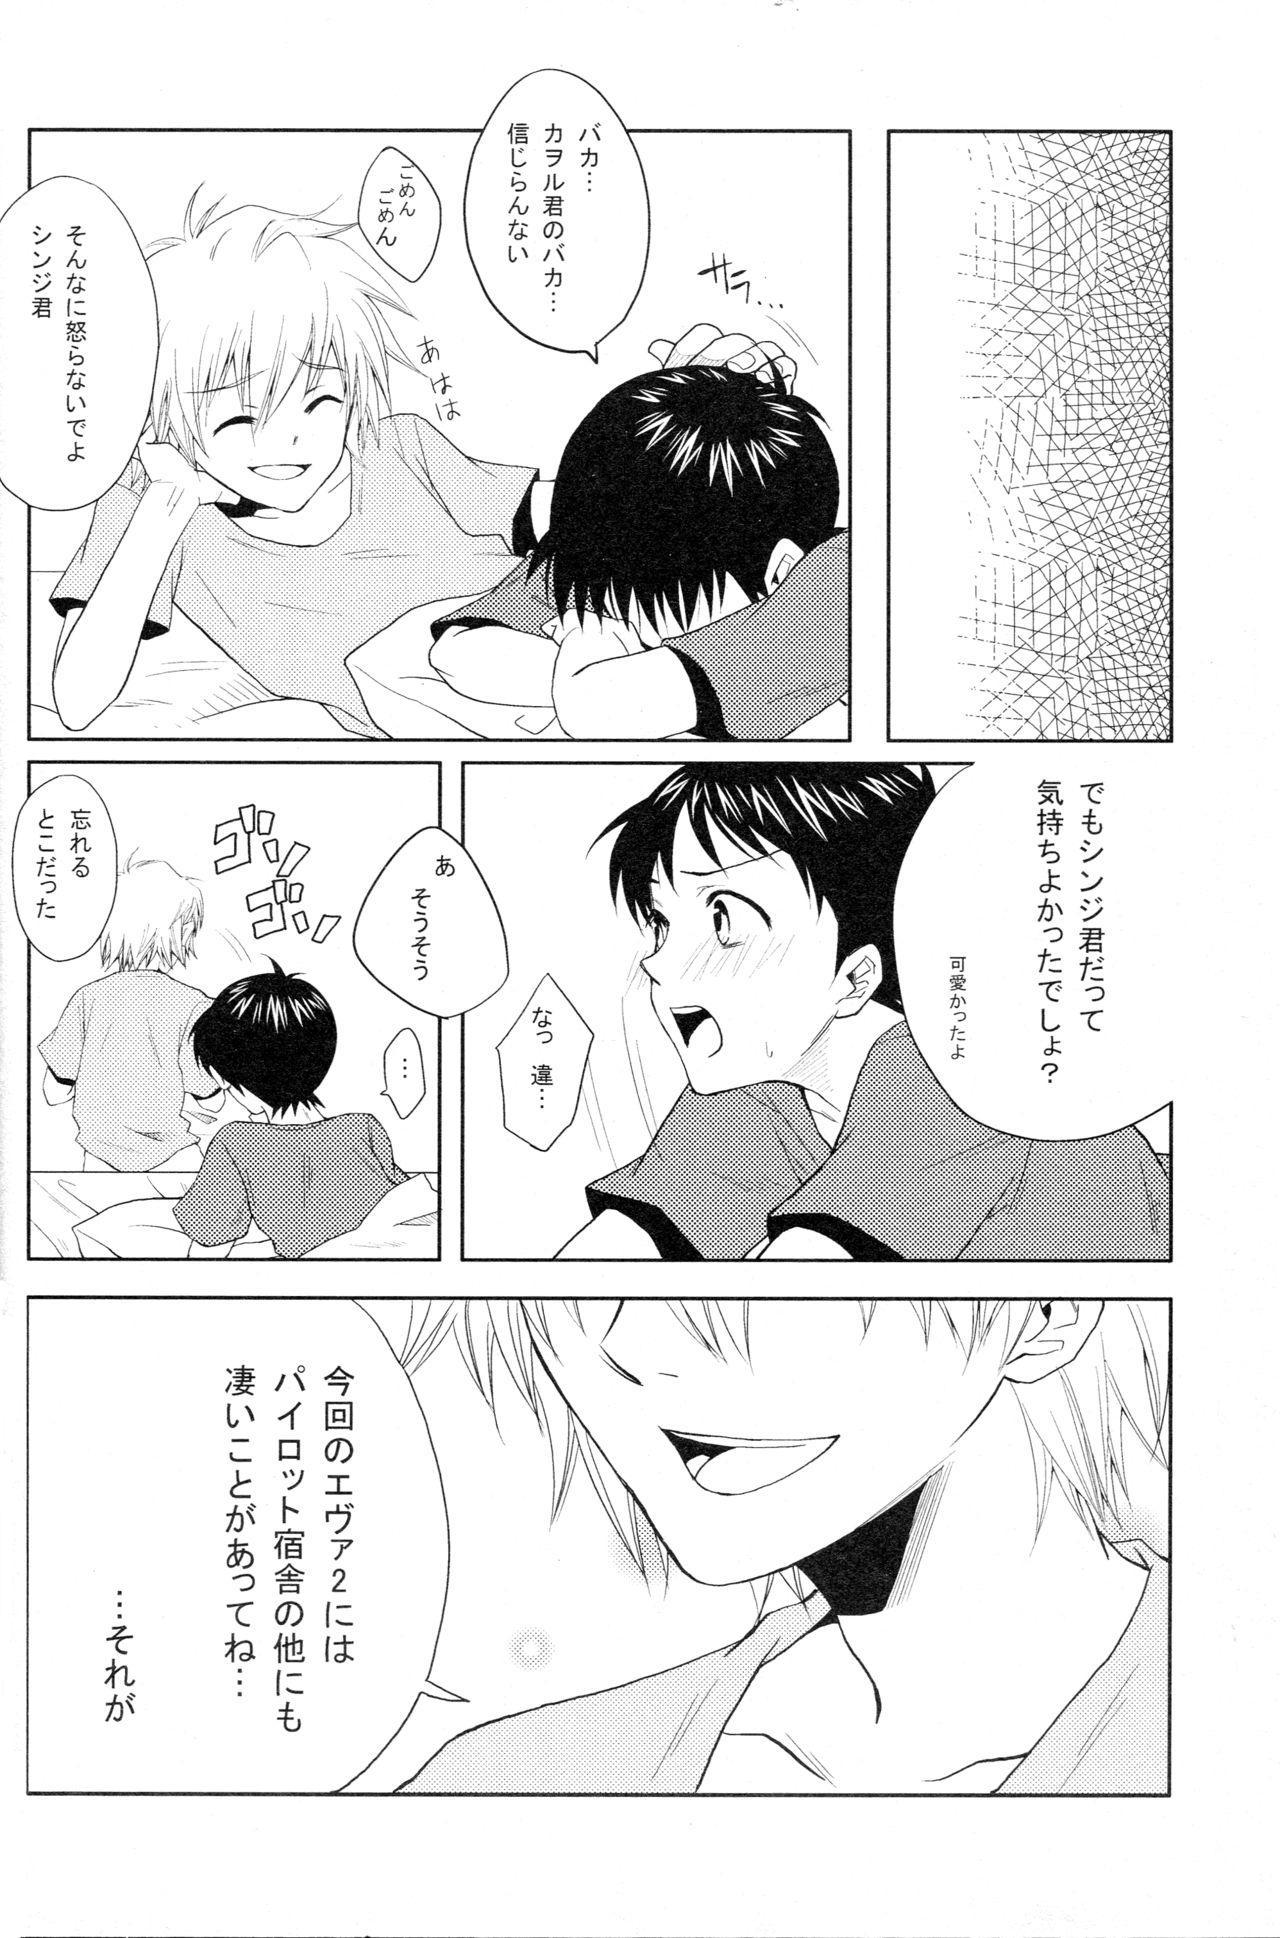 PSP Eva 2 no Susume 16